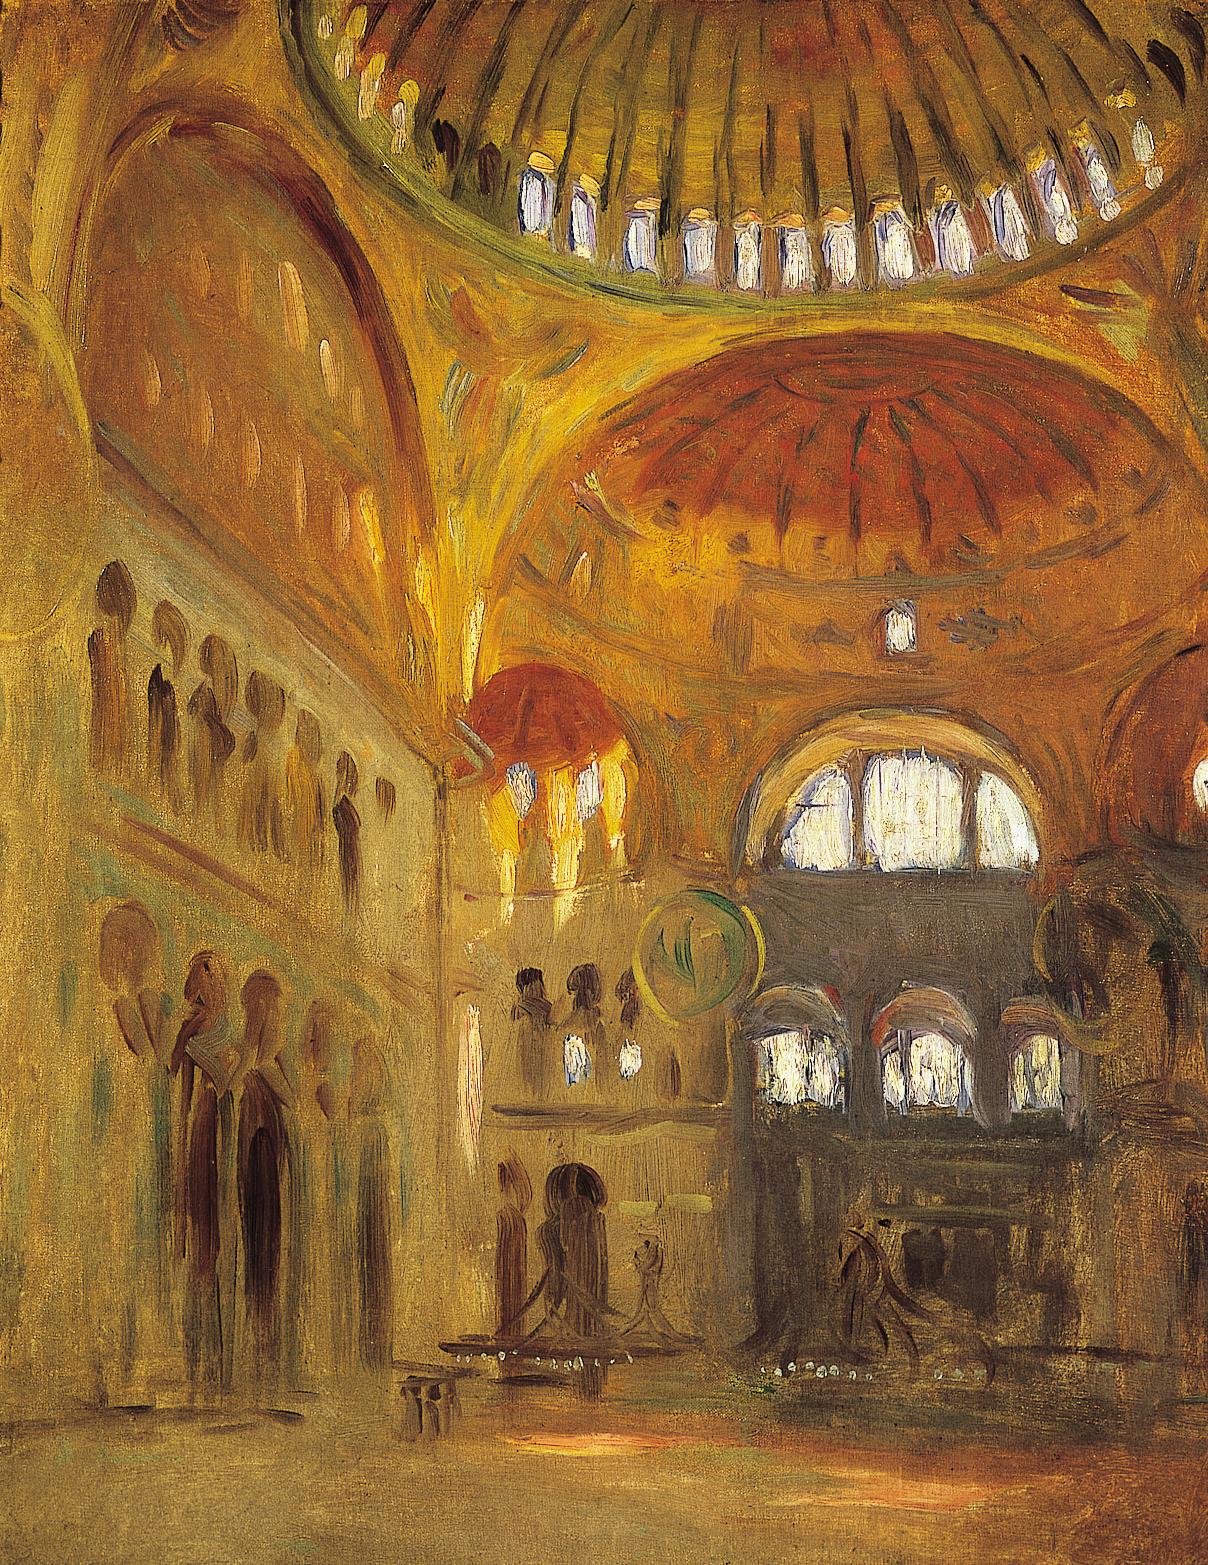 File:Interior of the Hagia Sophia.jpg